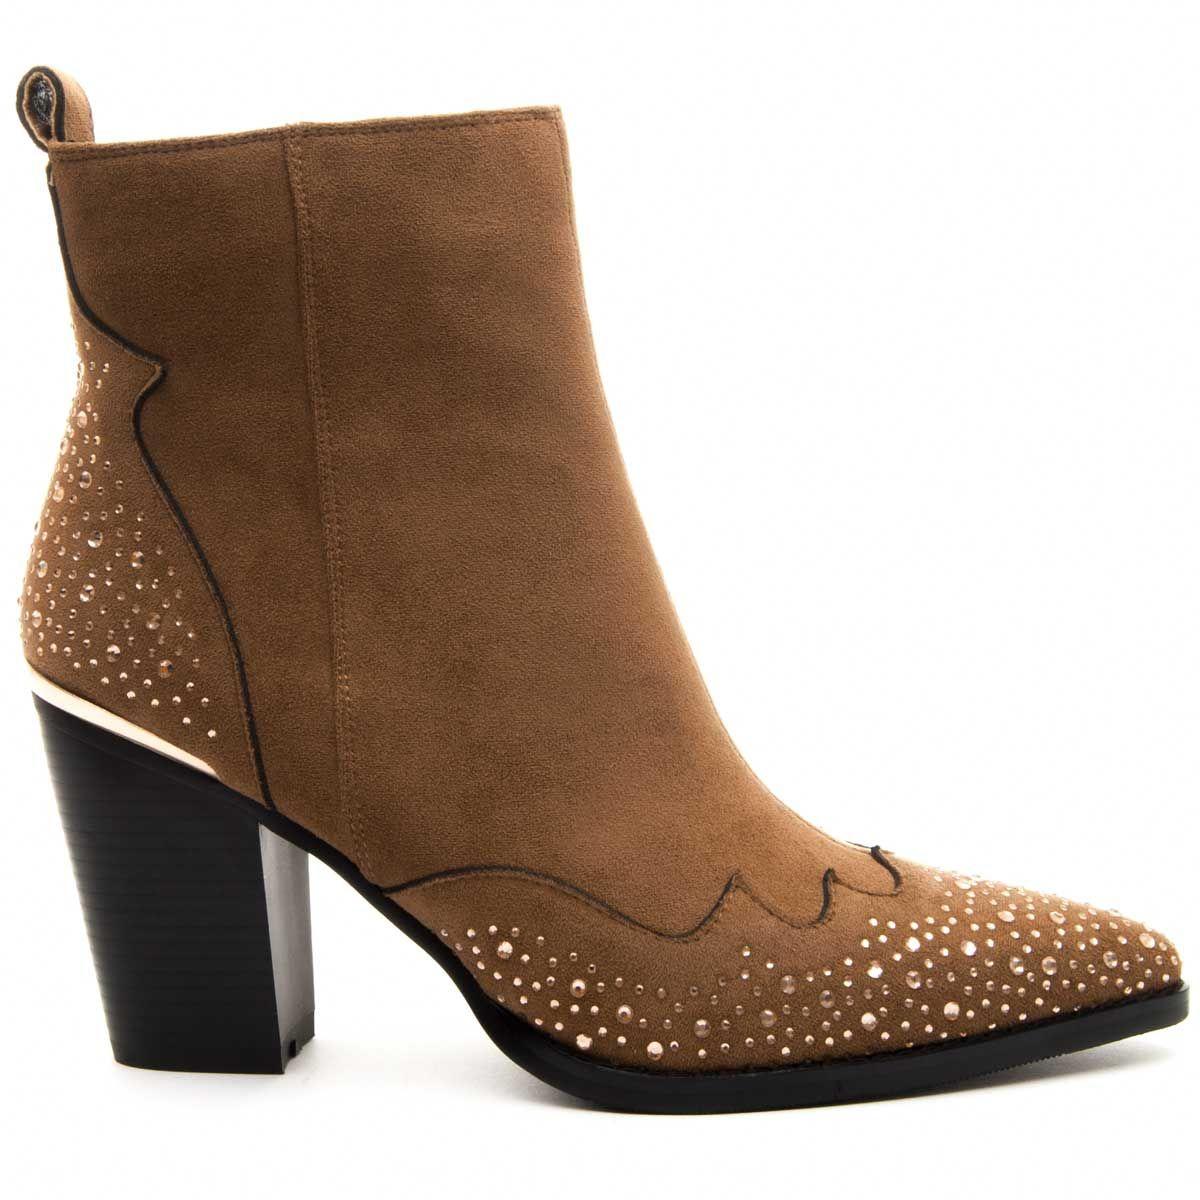 Montevita Heeled Western Ankle Boot in Brown